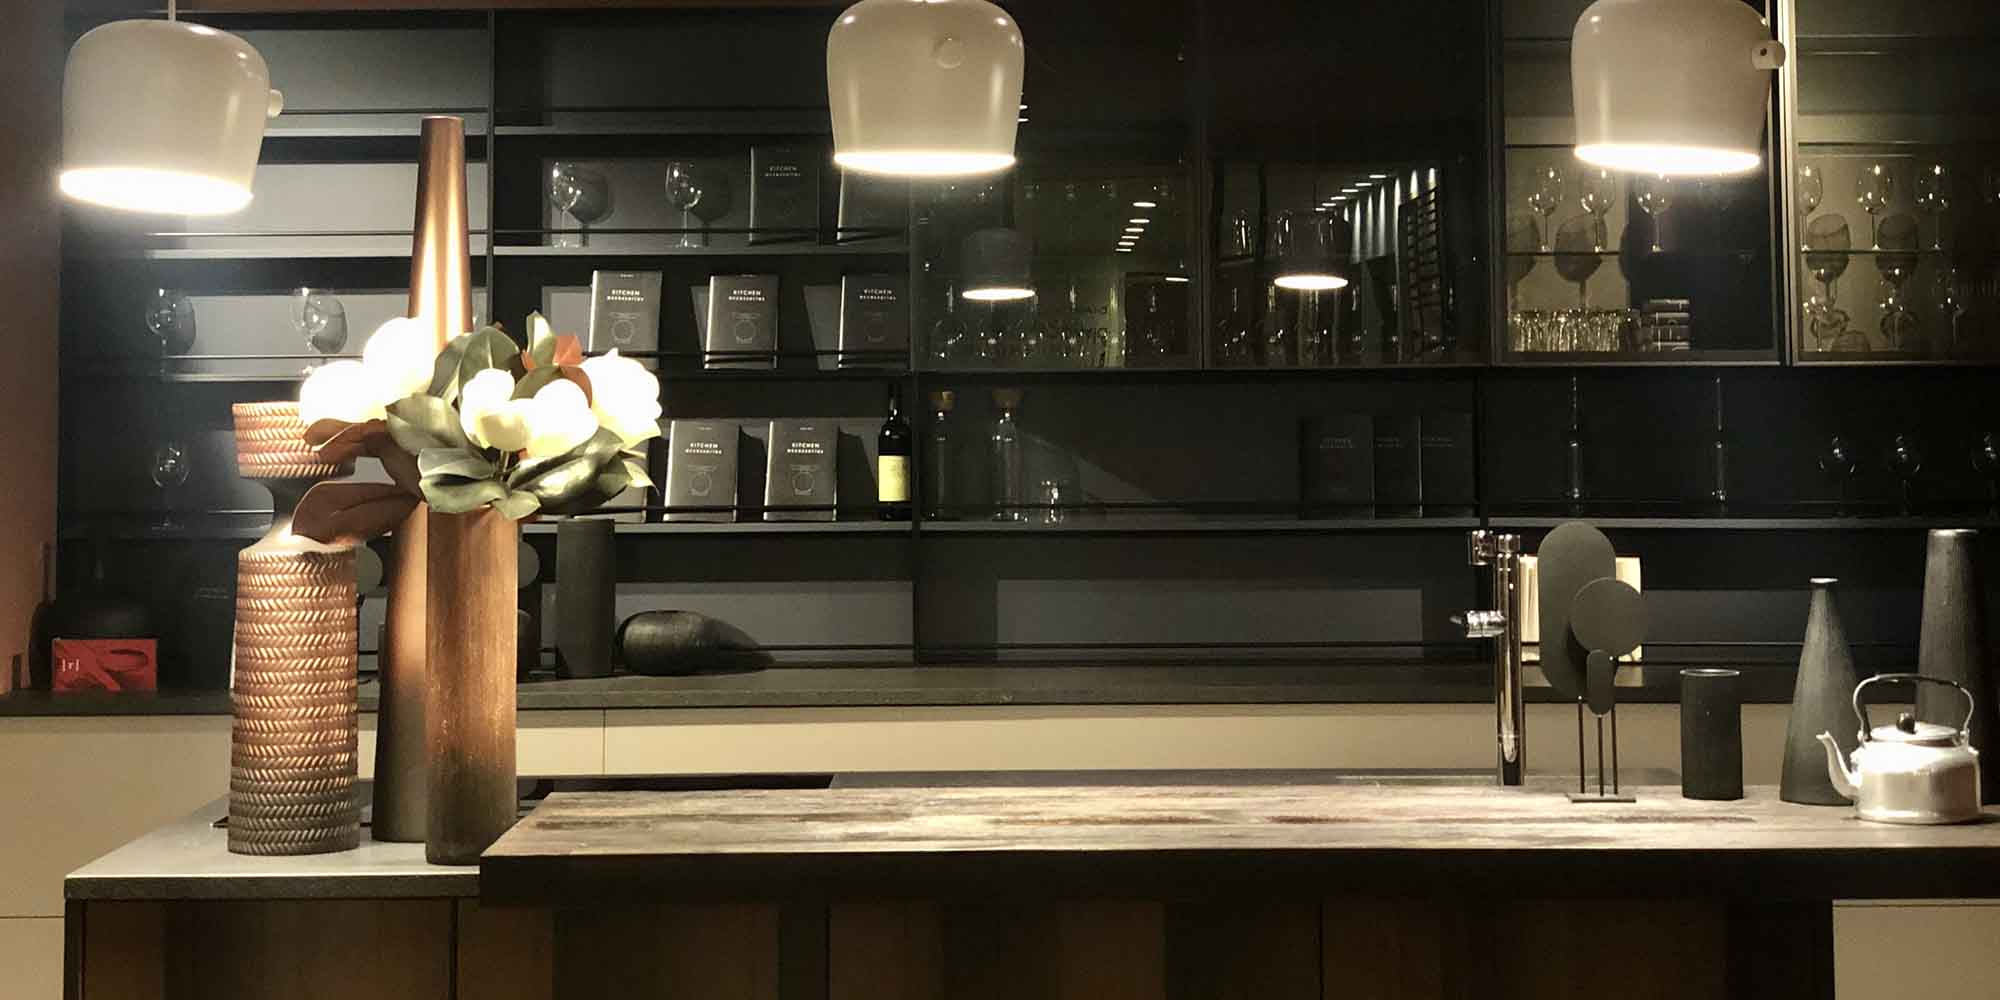 MetroQuality Prodotti R1 Rastelli Cucine